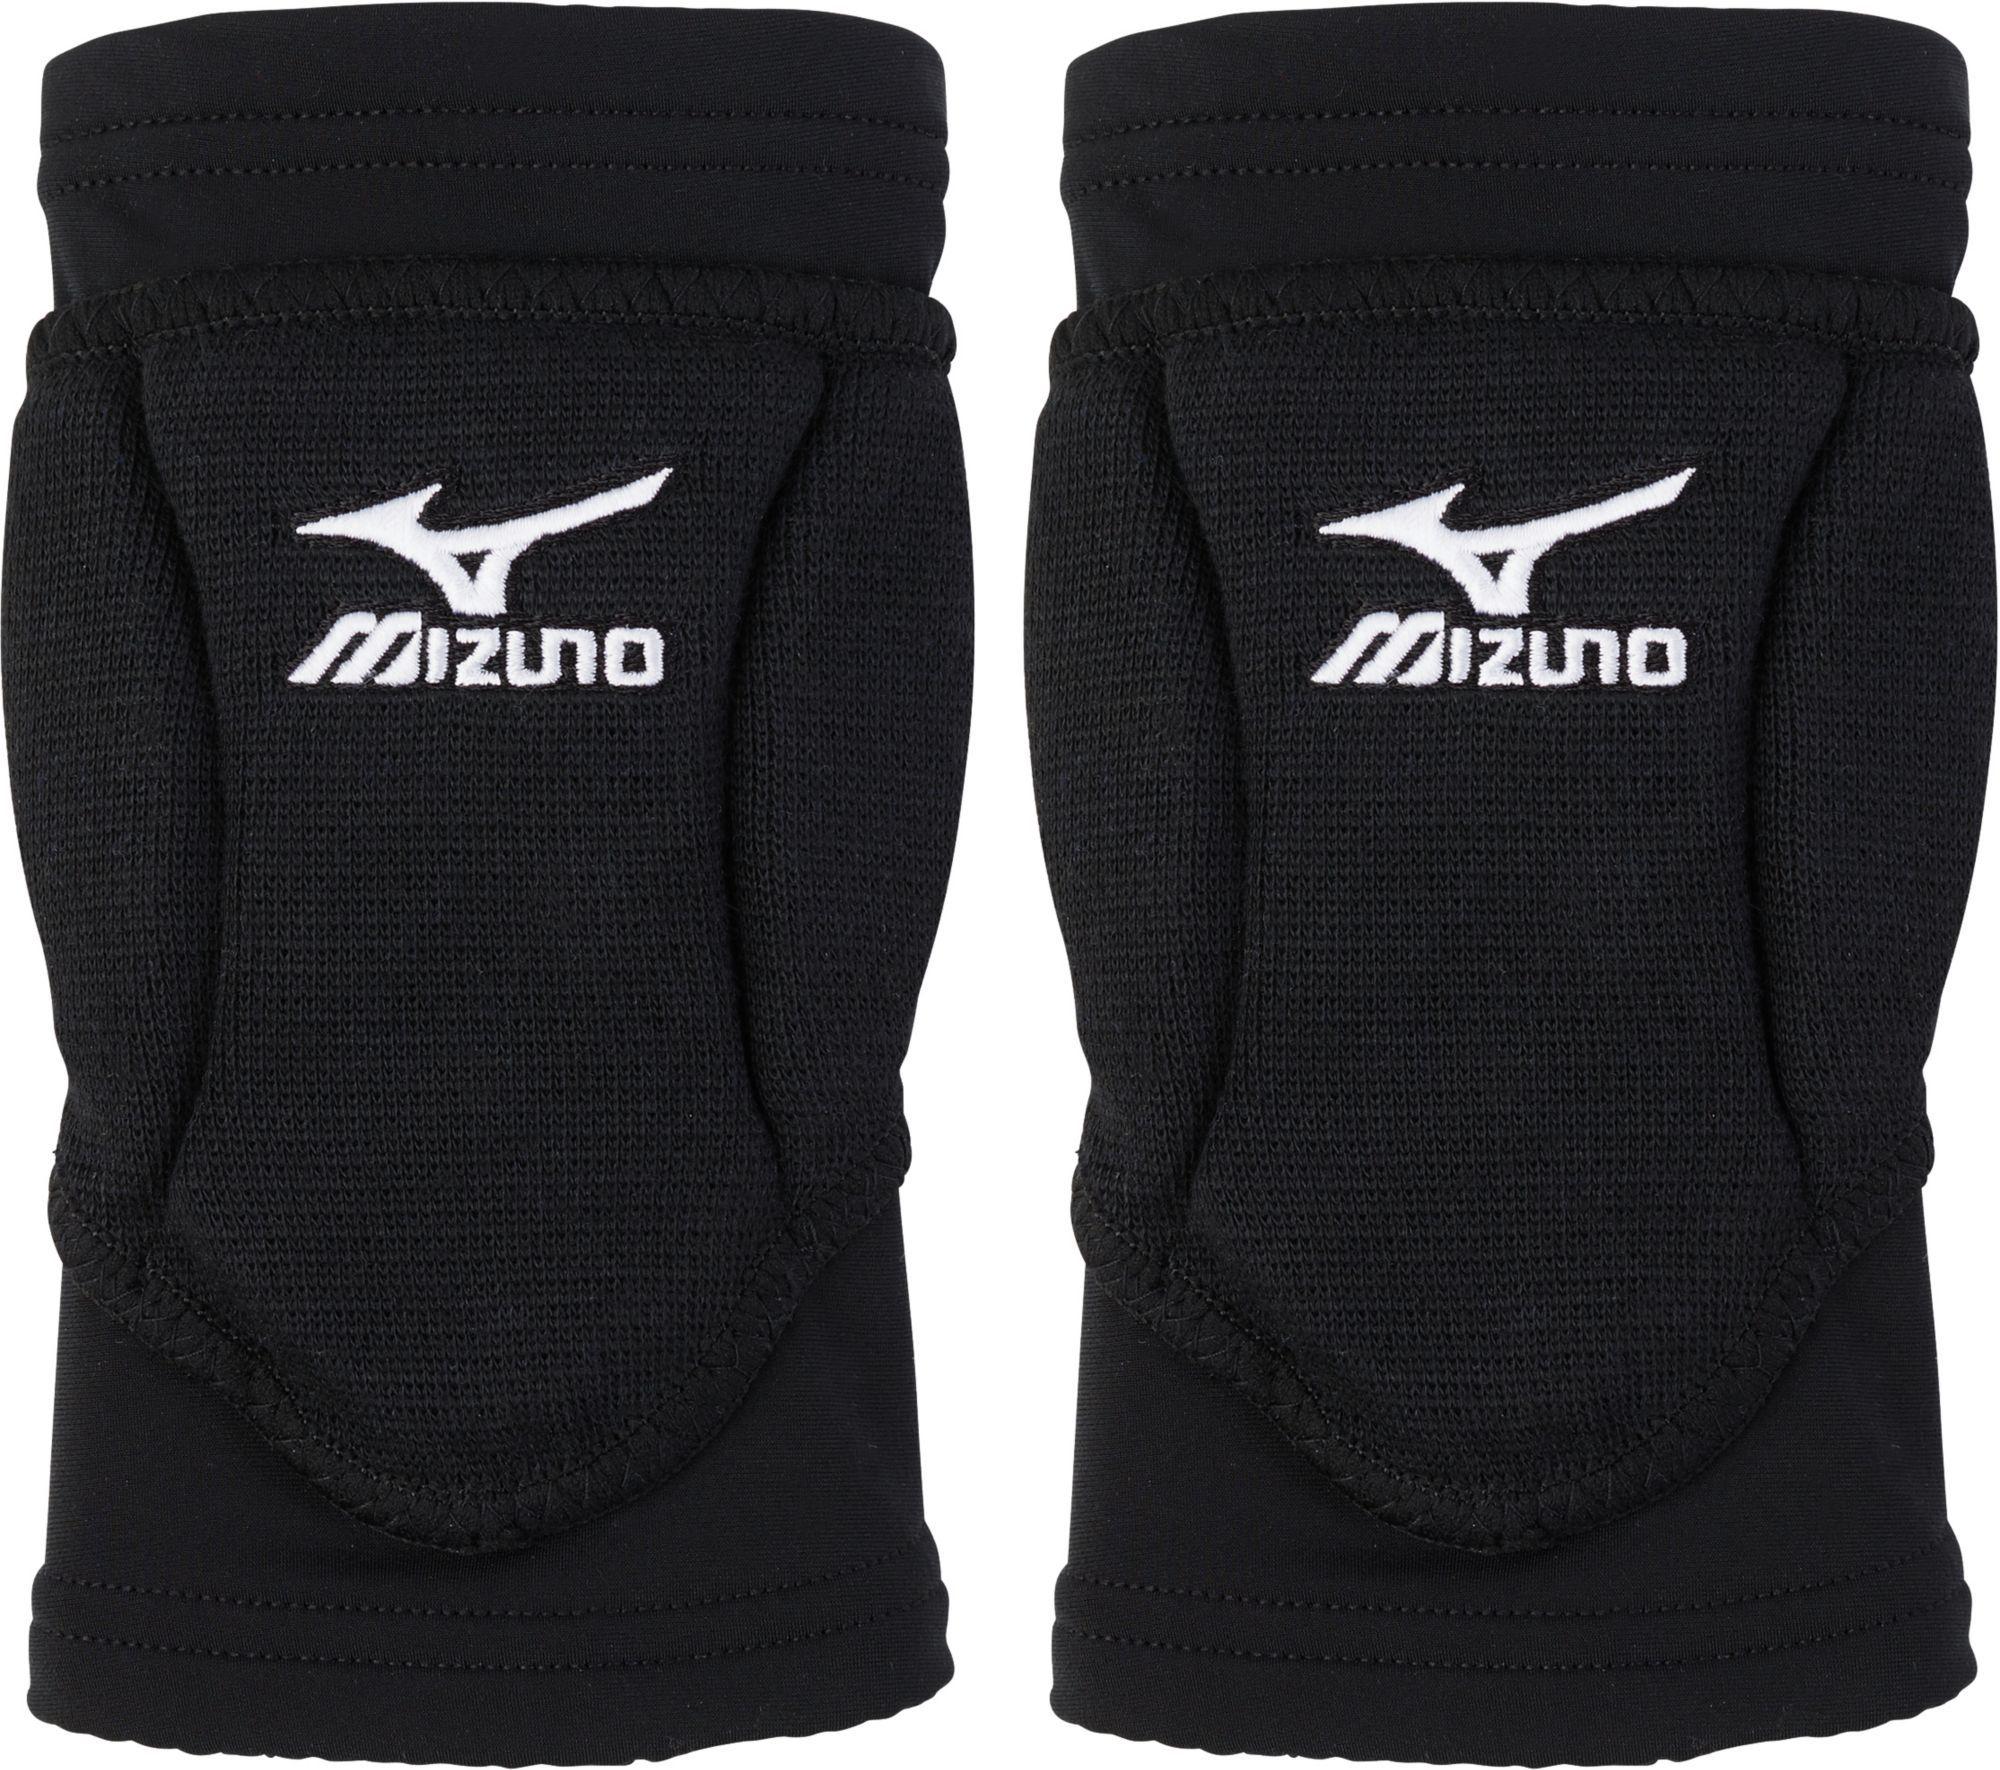 Mizuno Ventus Volleyball Knee Pads Black